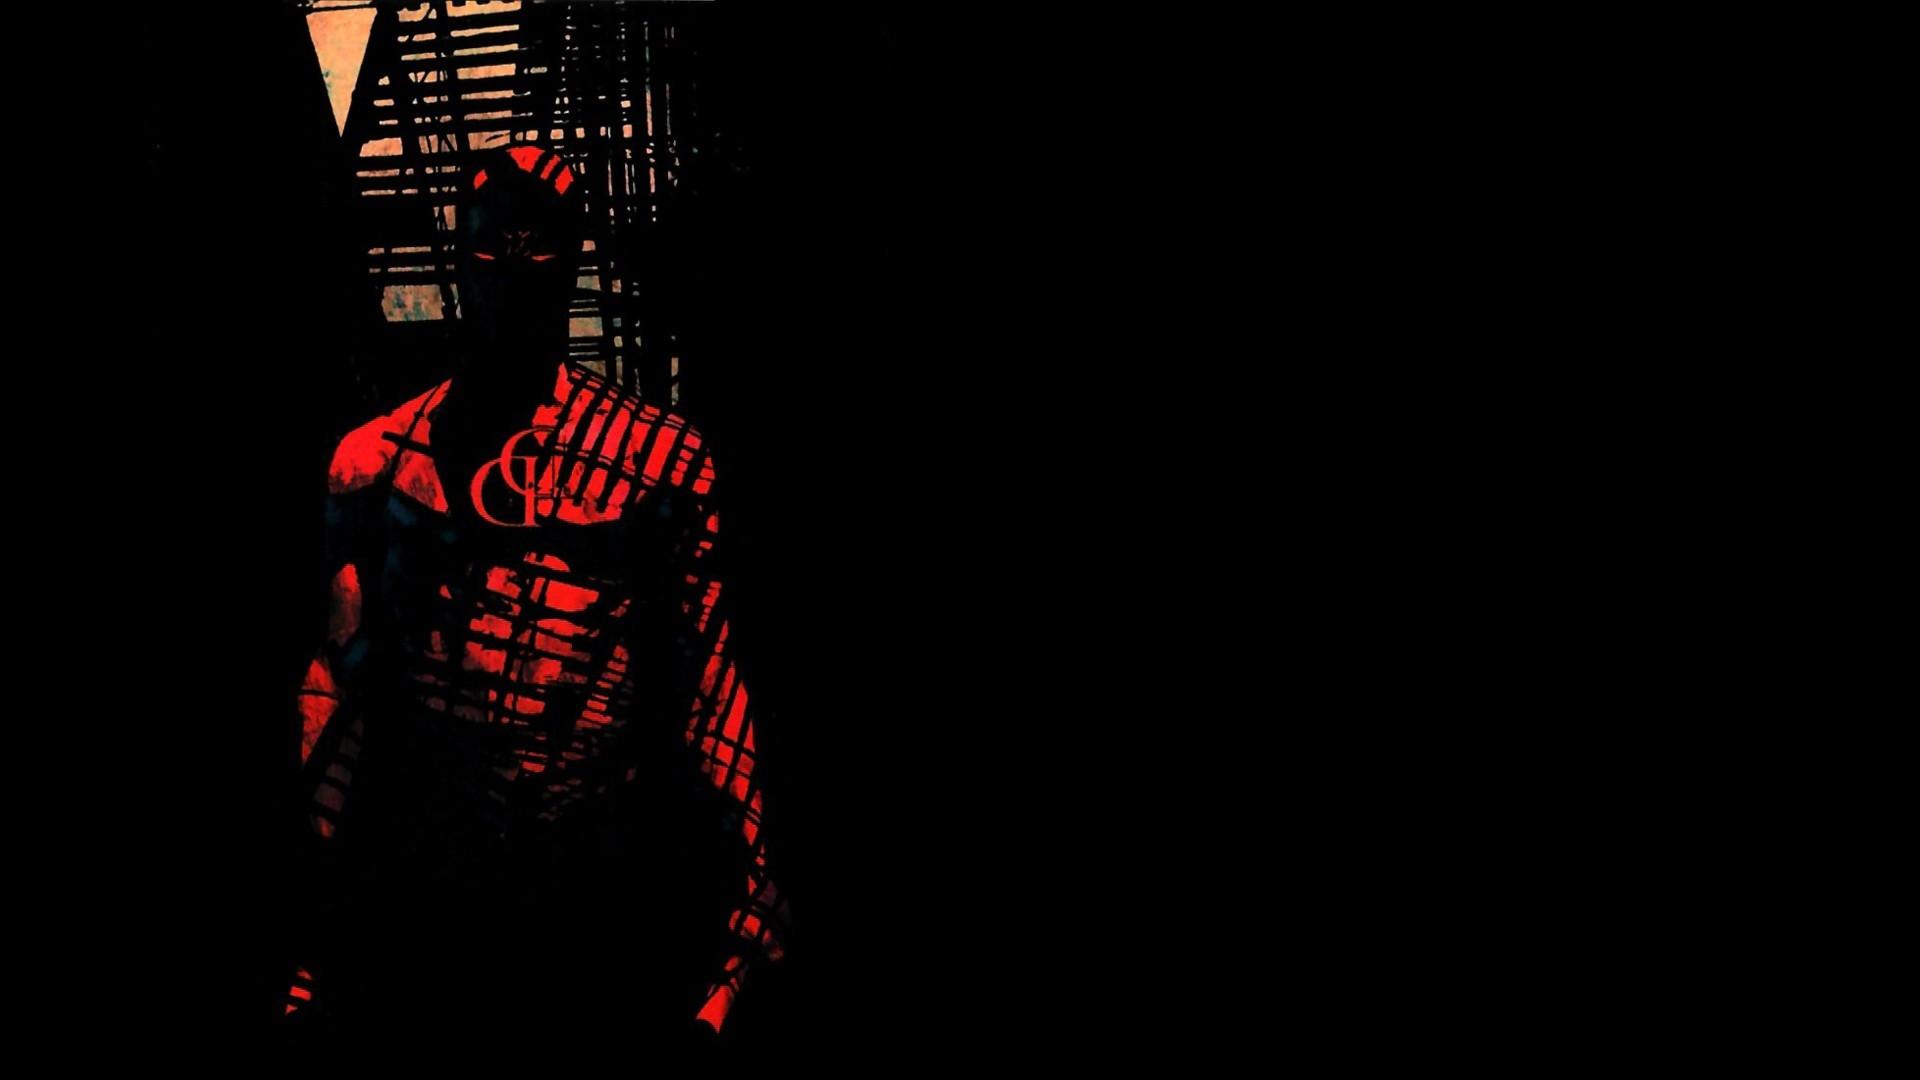 Daredevil Netflix Movie Wallpapers | Download Free Desktop Wallpaper .